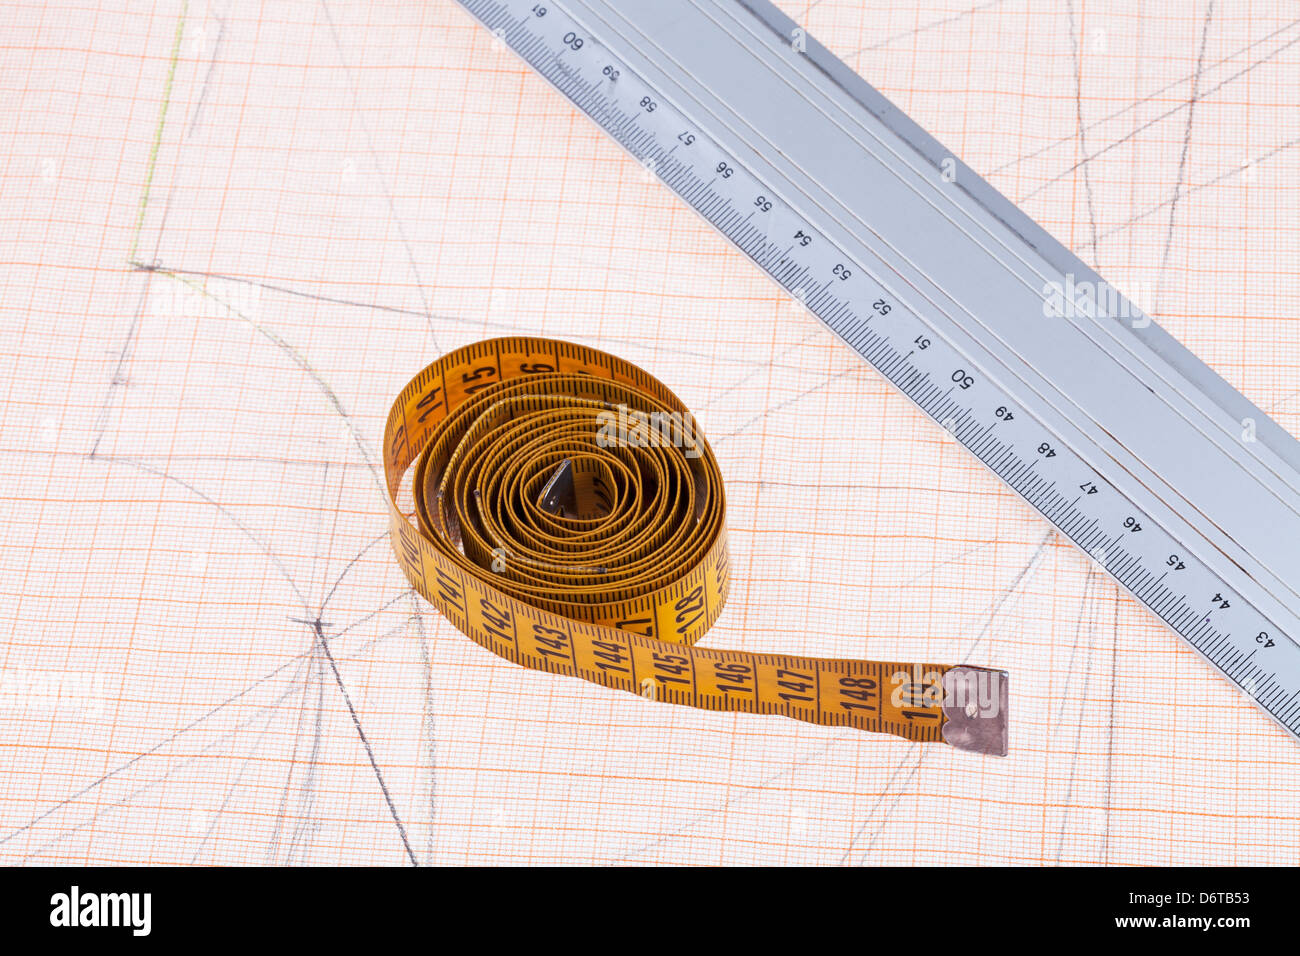 yellow measure tape and metal ruler at graph paper - Stock Image